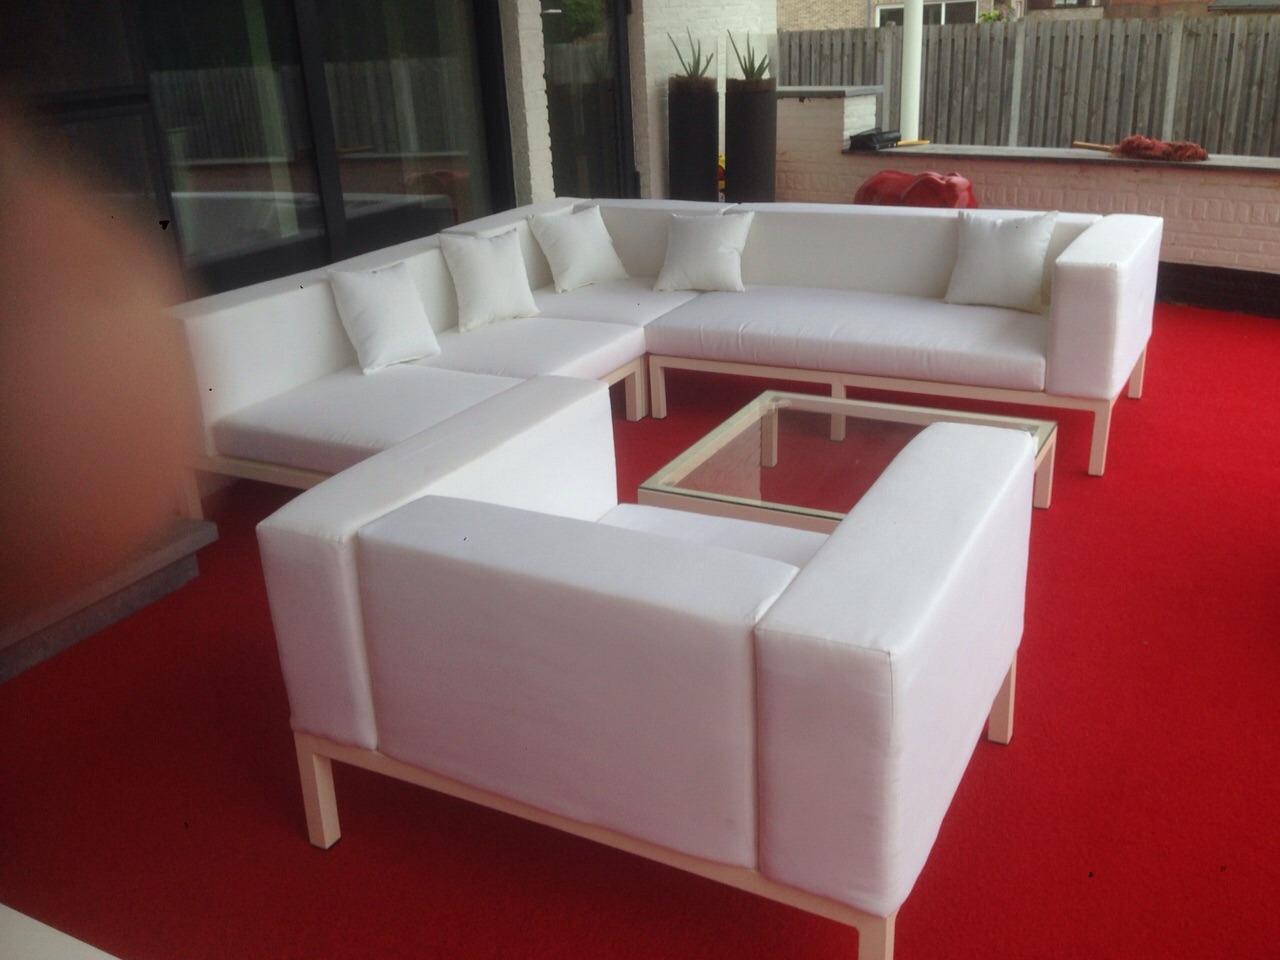 Loungeset Monaco wit bezorgd in Renkem (BE)